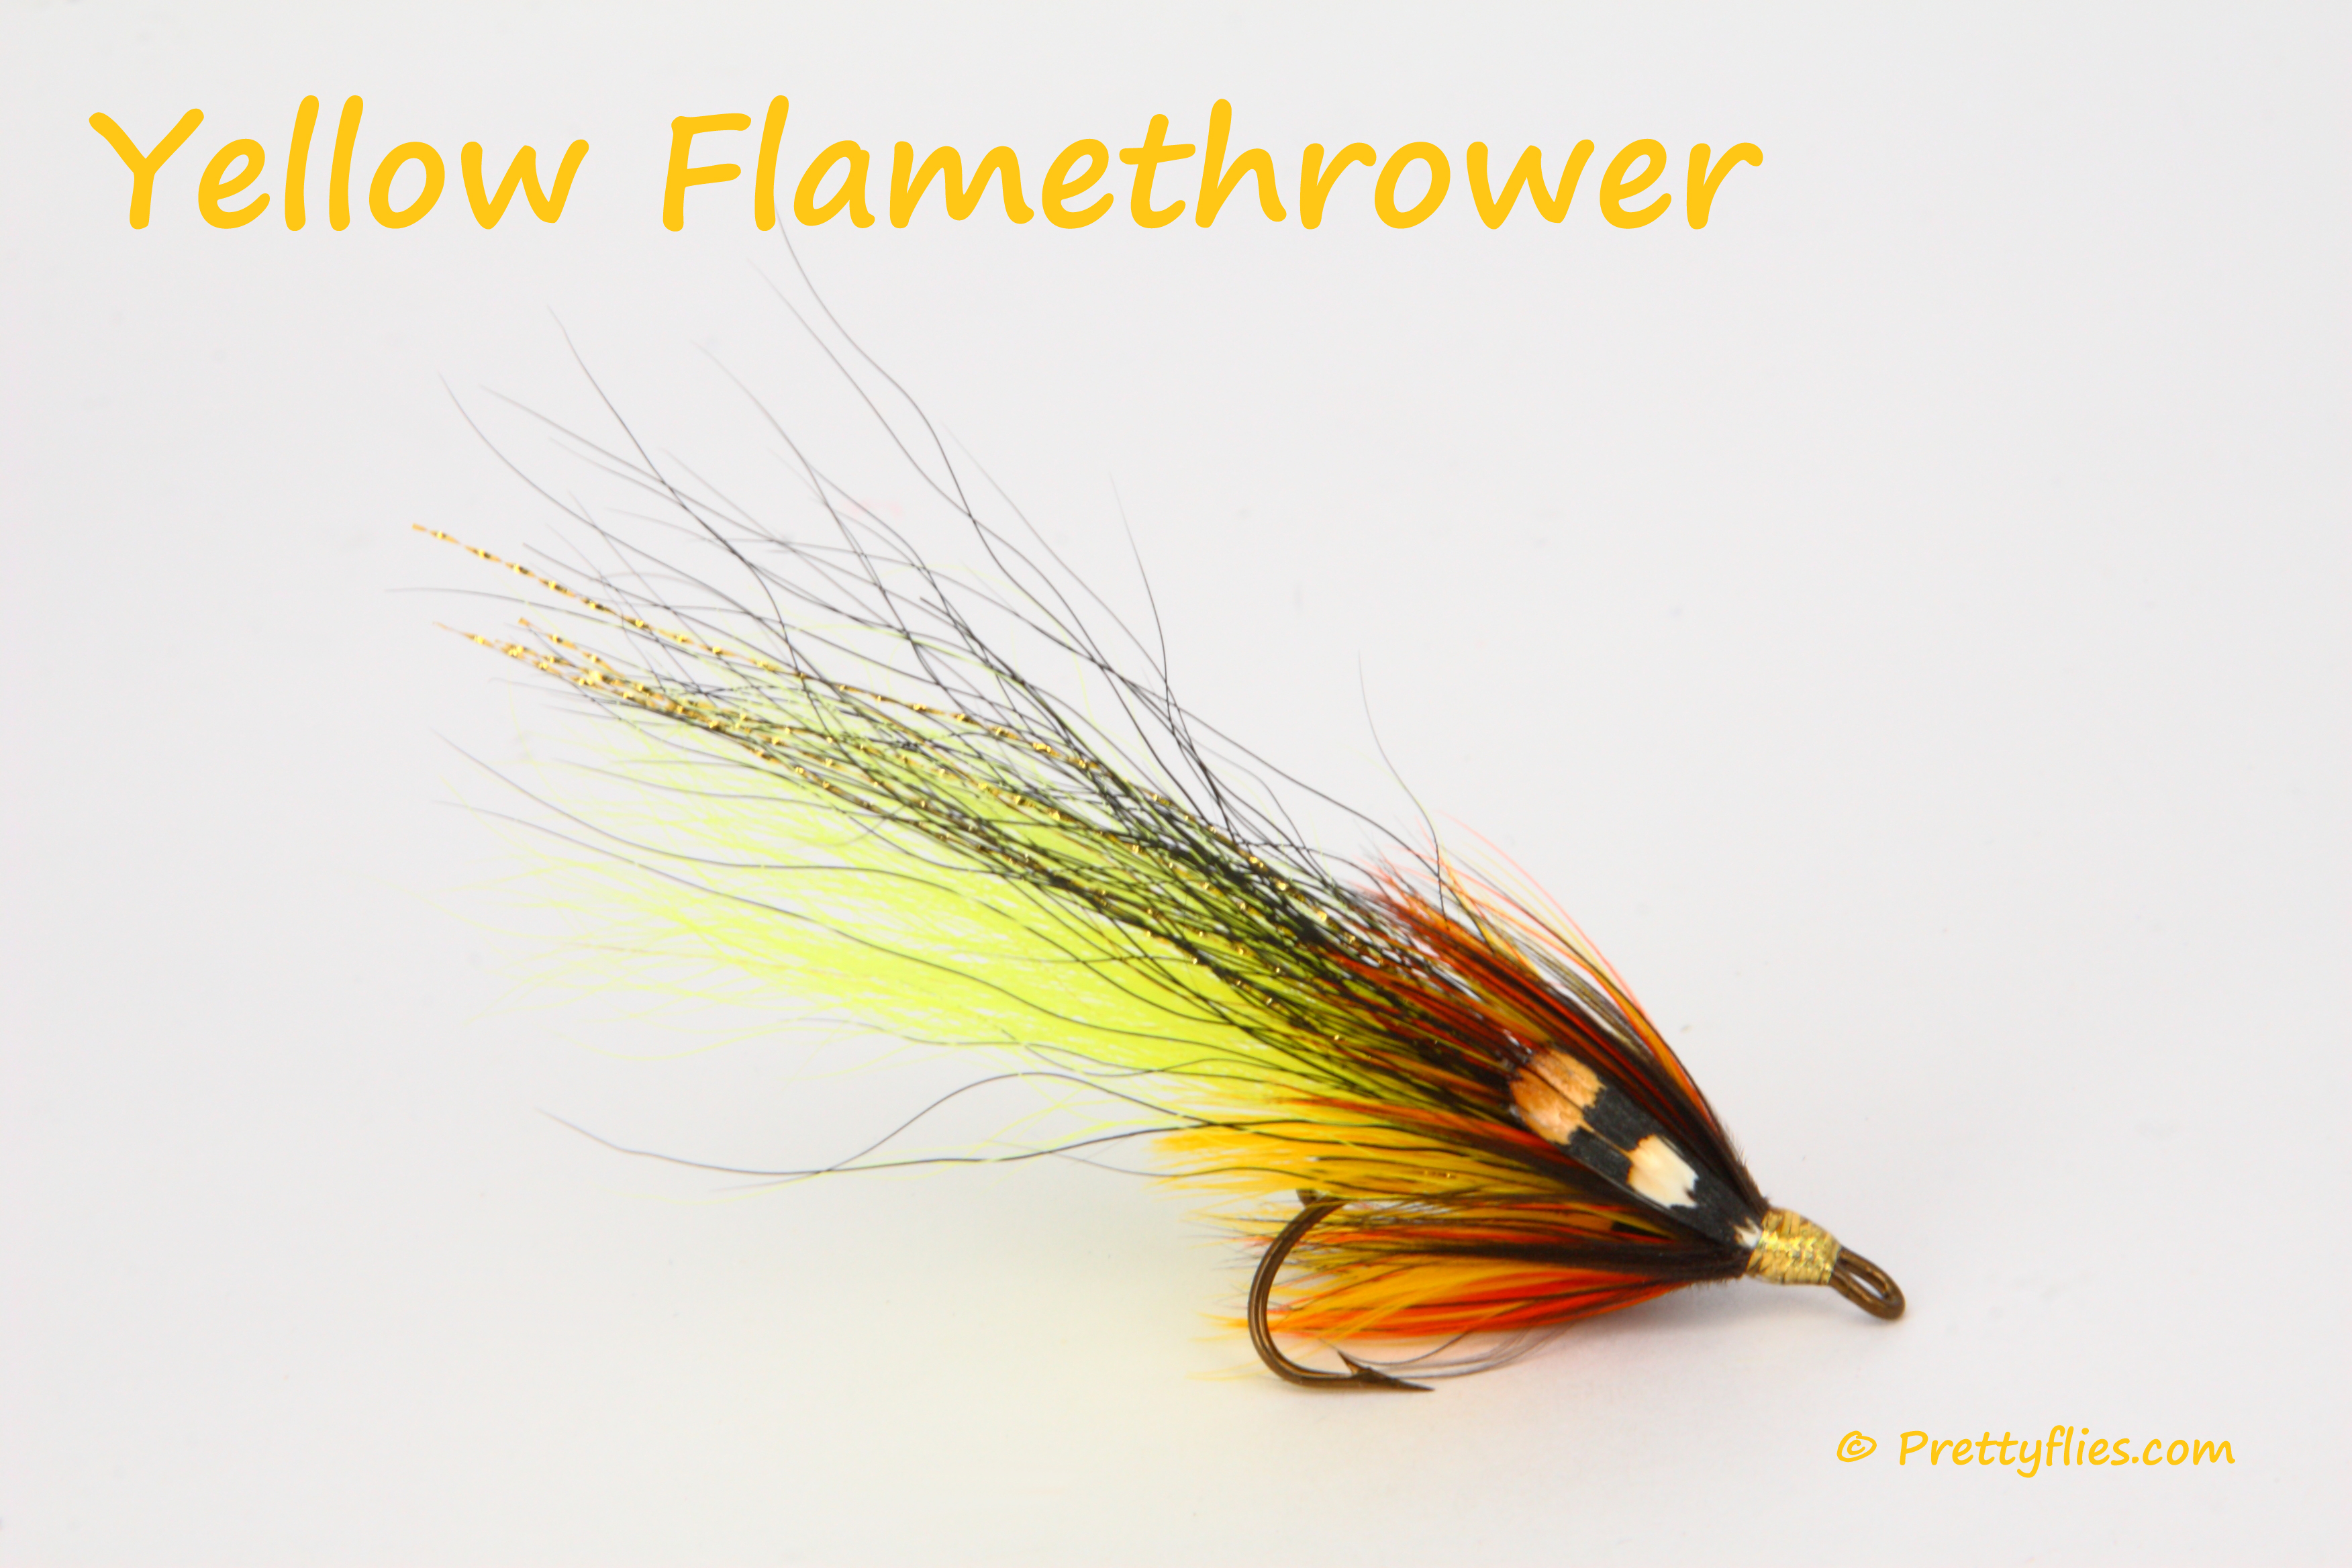 Yellow Flamethrower copy.jpg